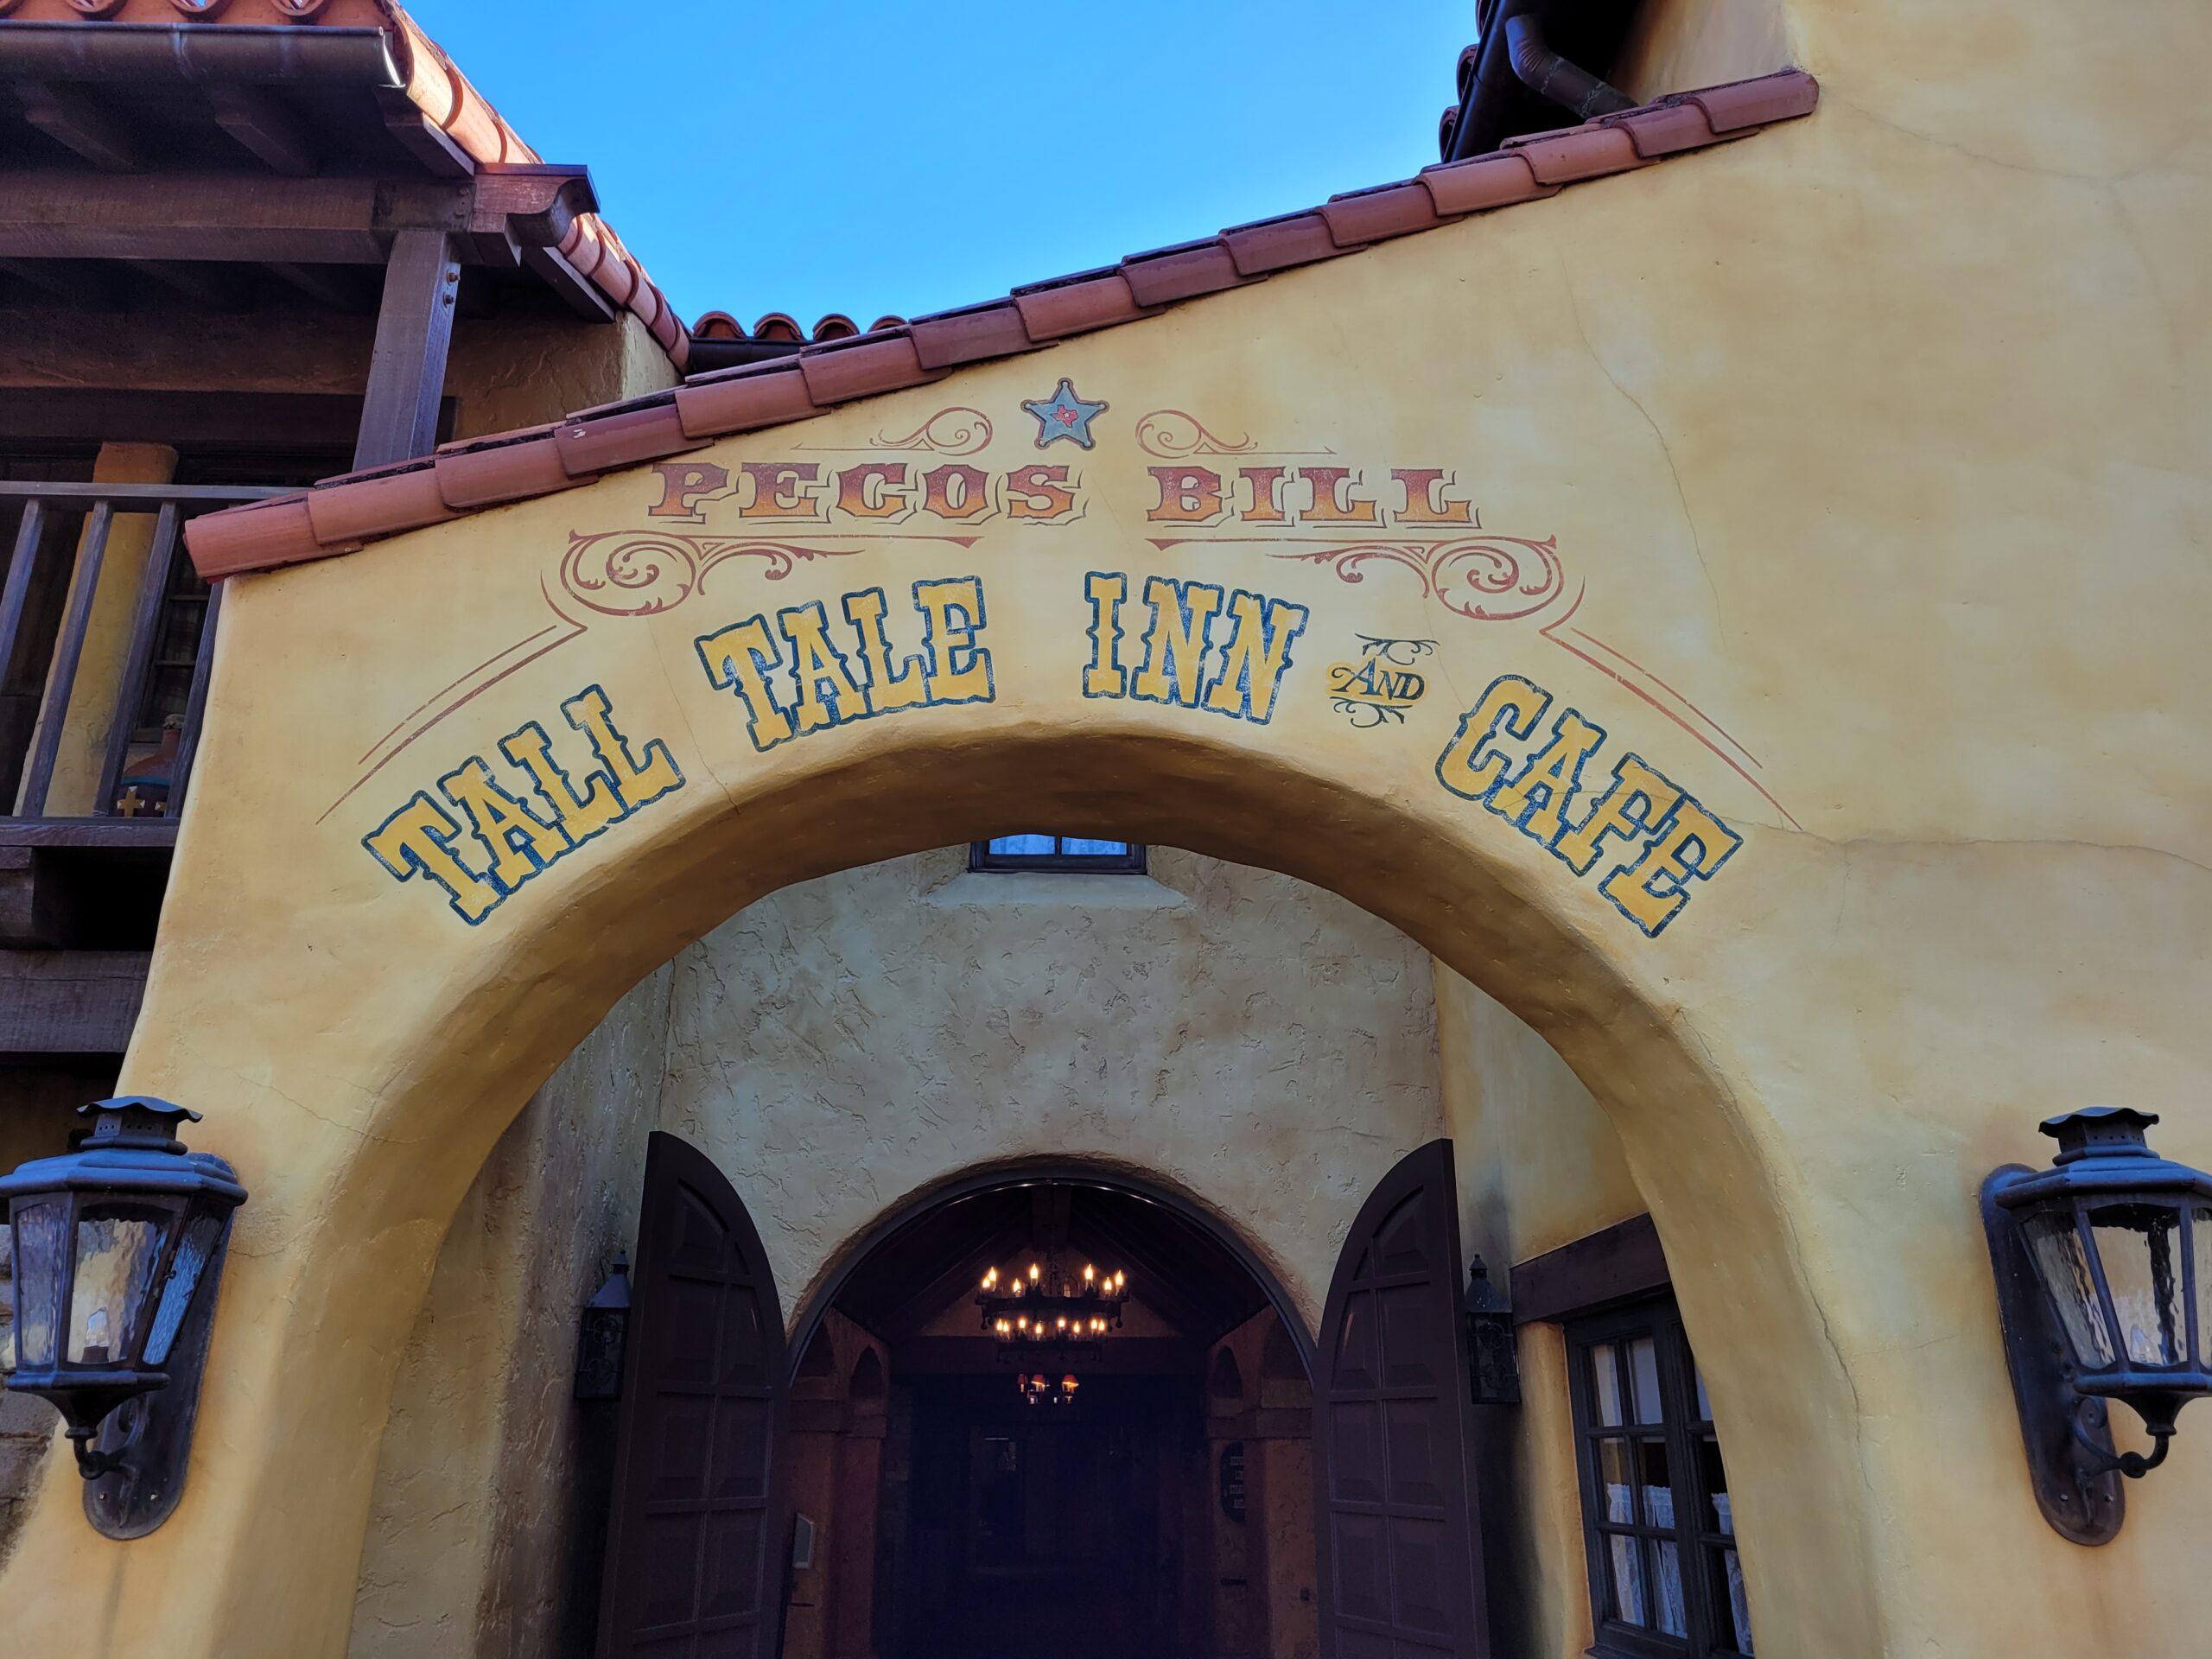 Pecos Bill Tall Tale Inn & Cafe Sign